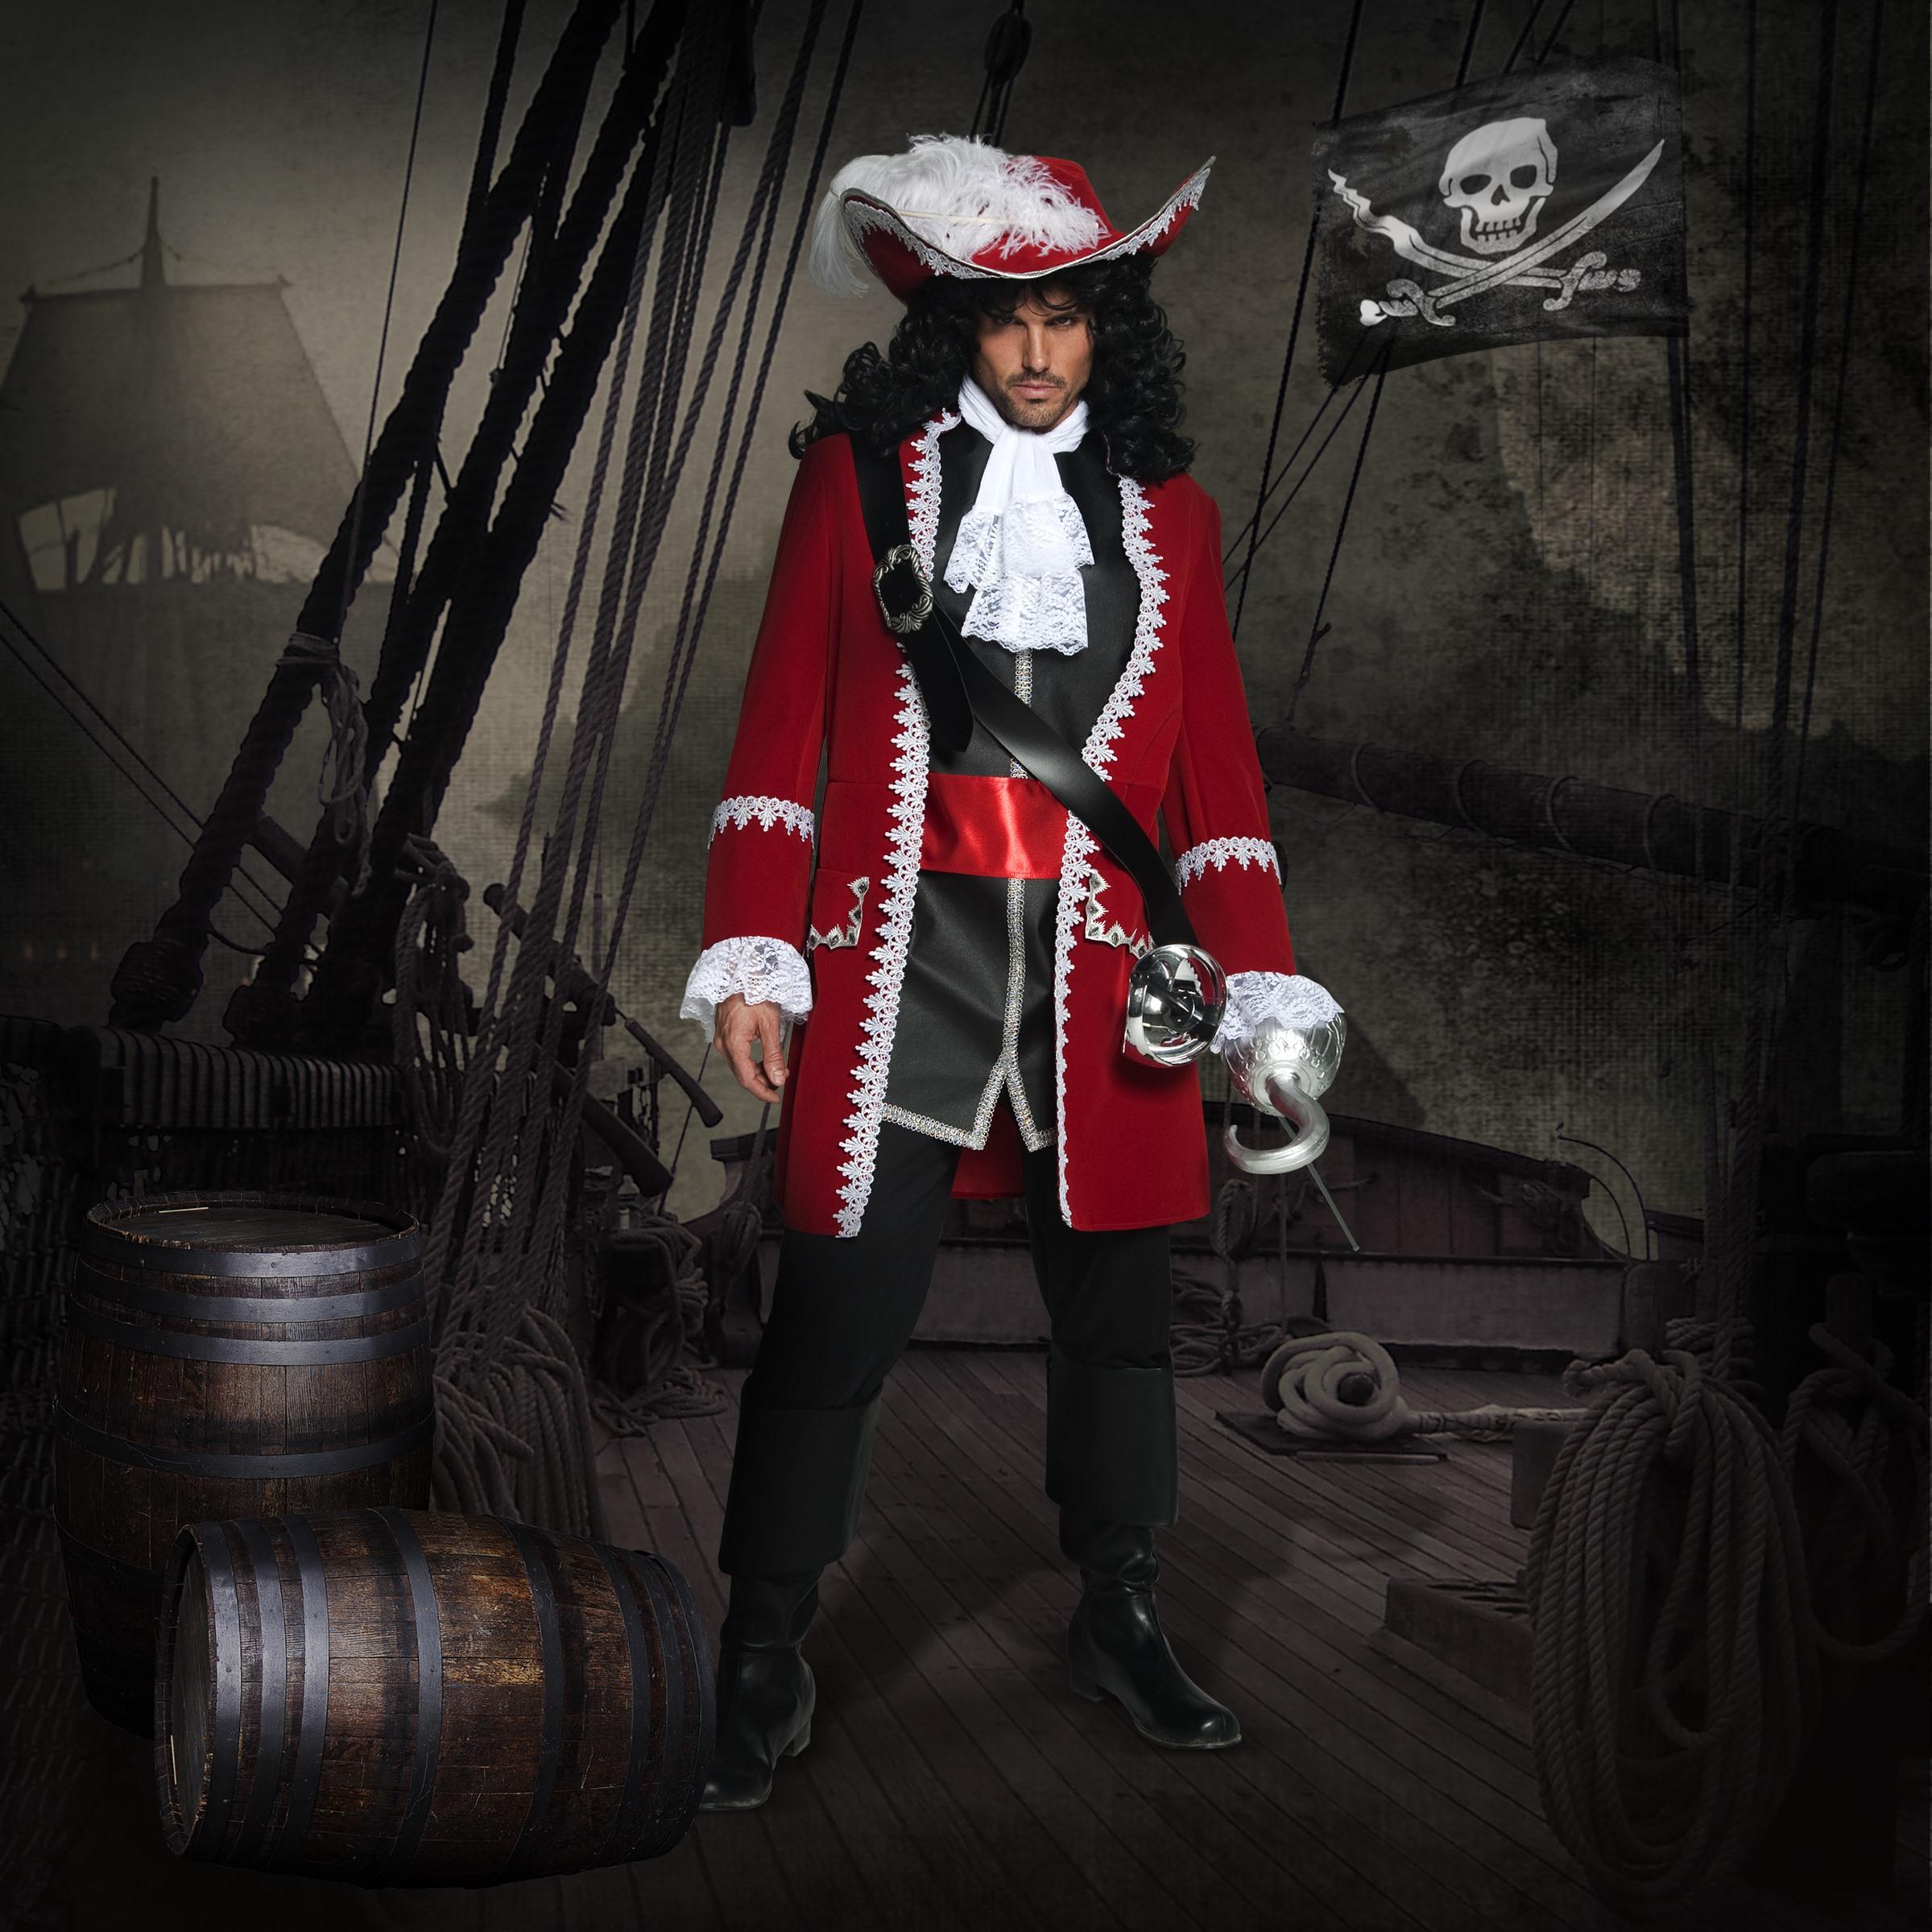 pirate_sc_01.jpg